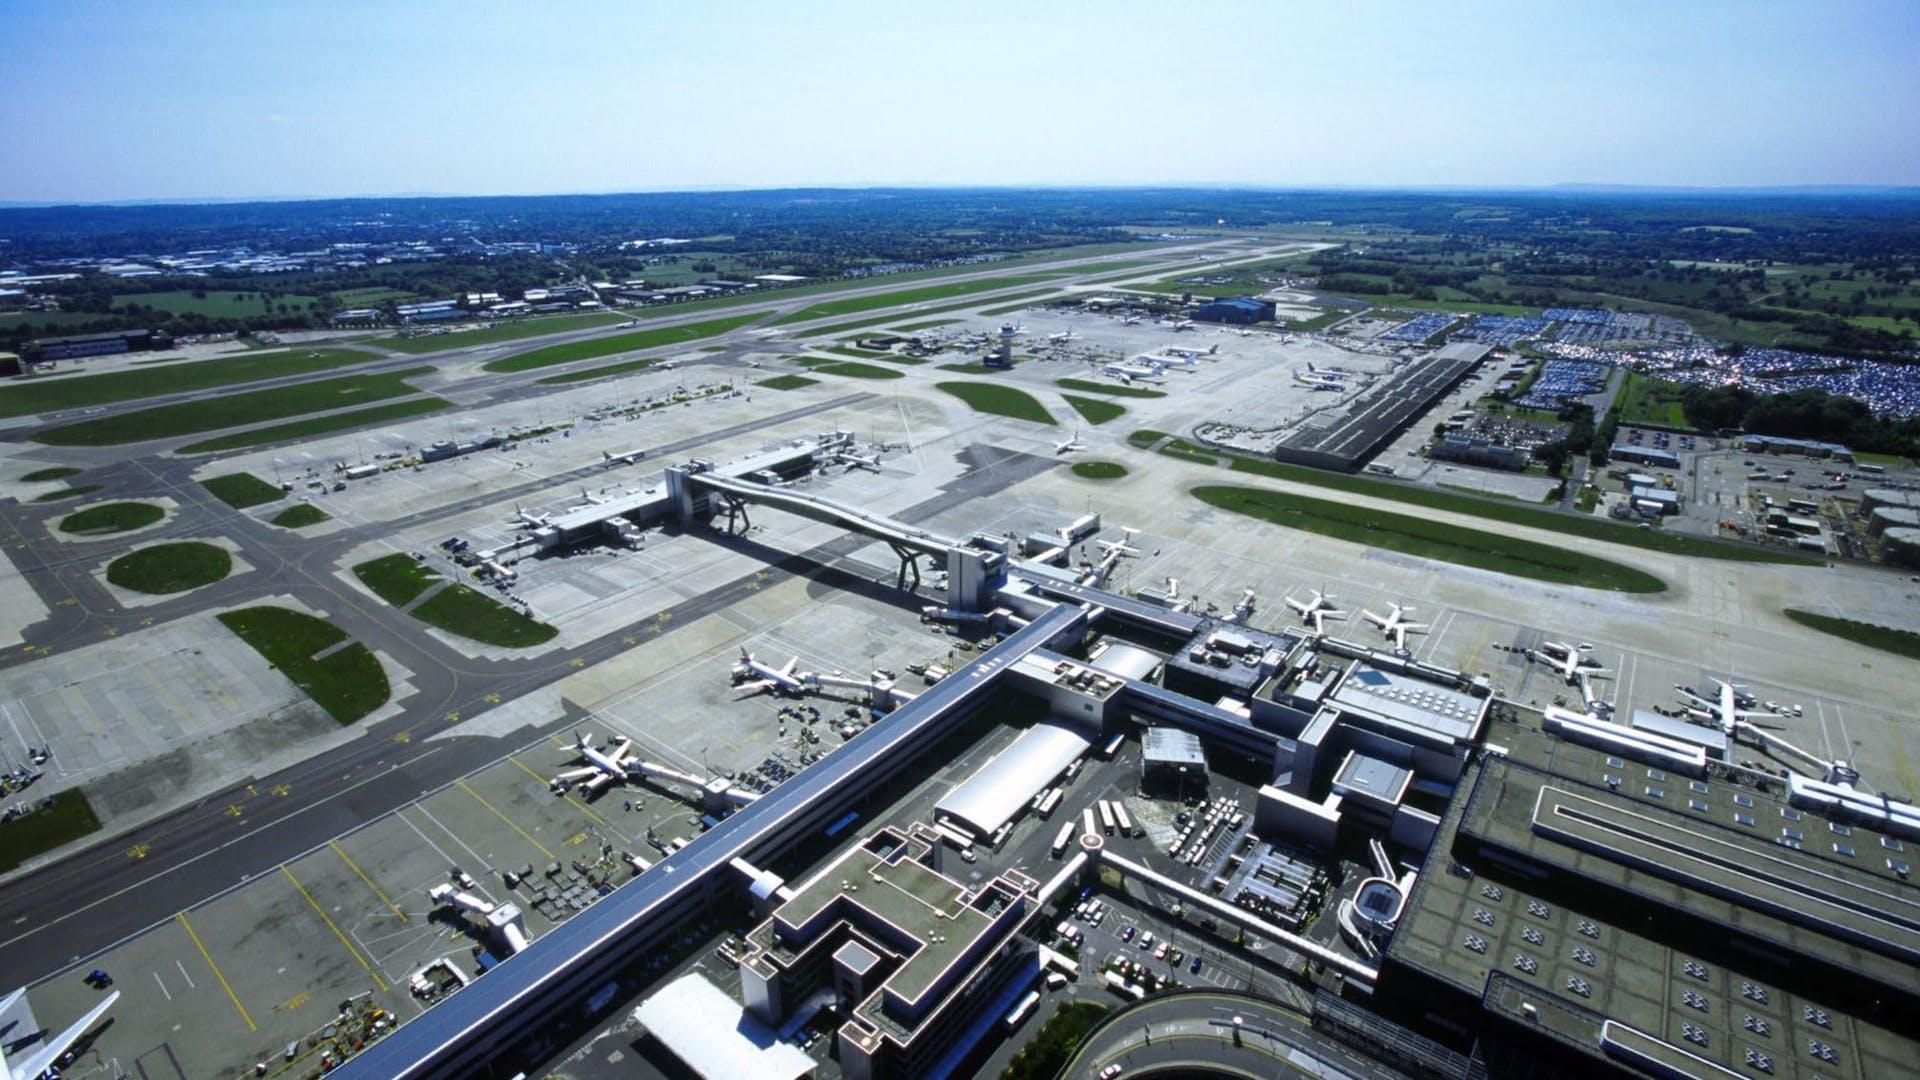 Gatwick Airport runway and terminal buildings